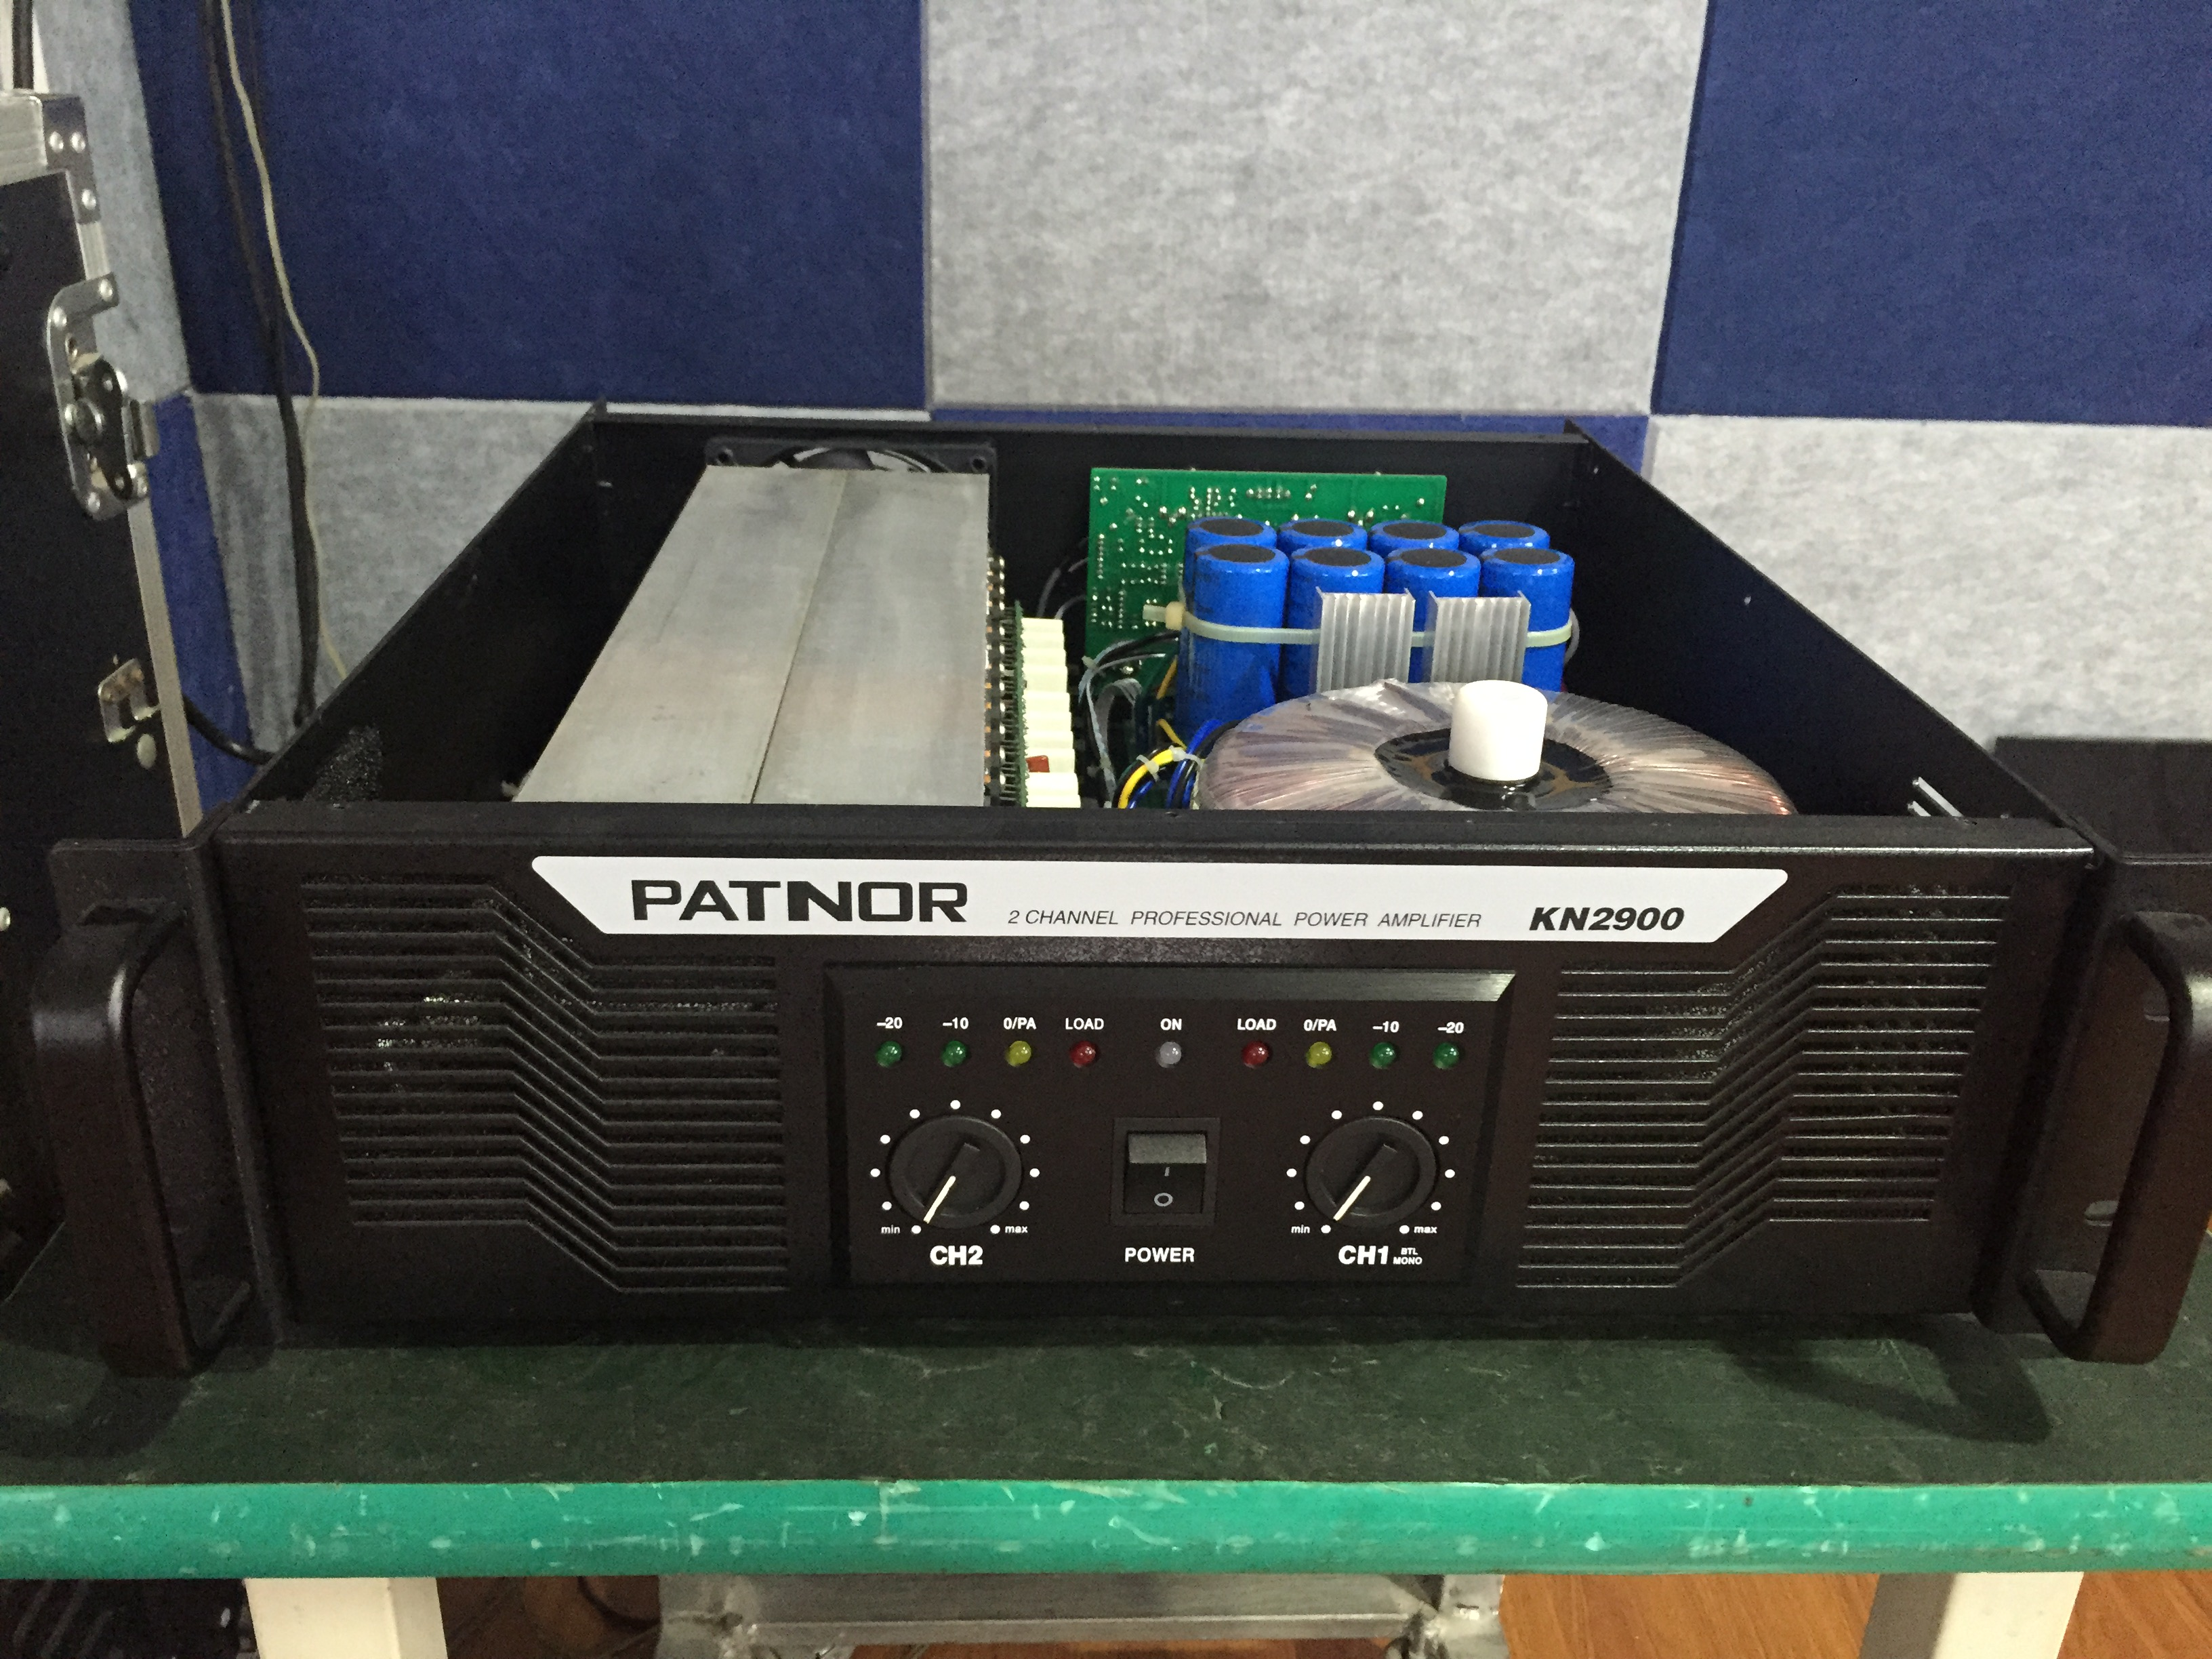 China Power Audio Amplifier, China Power Audio Amplifier